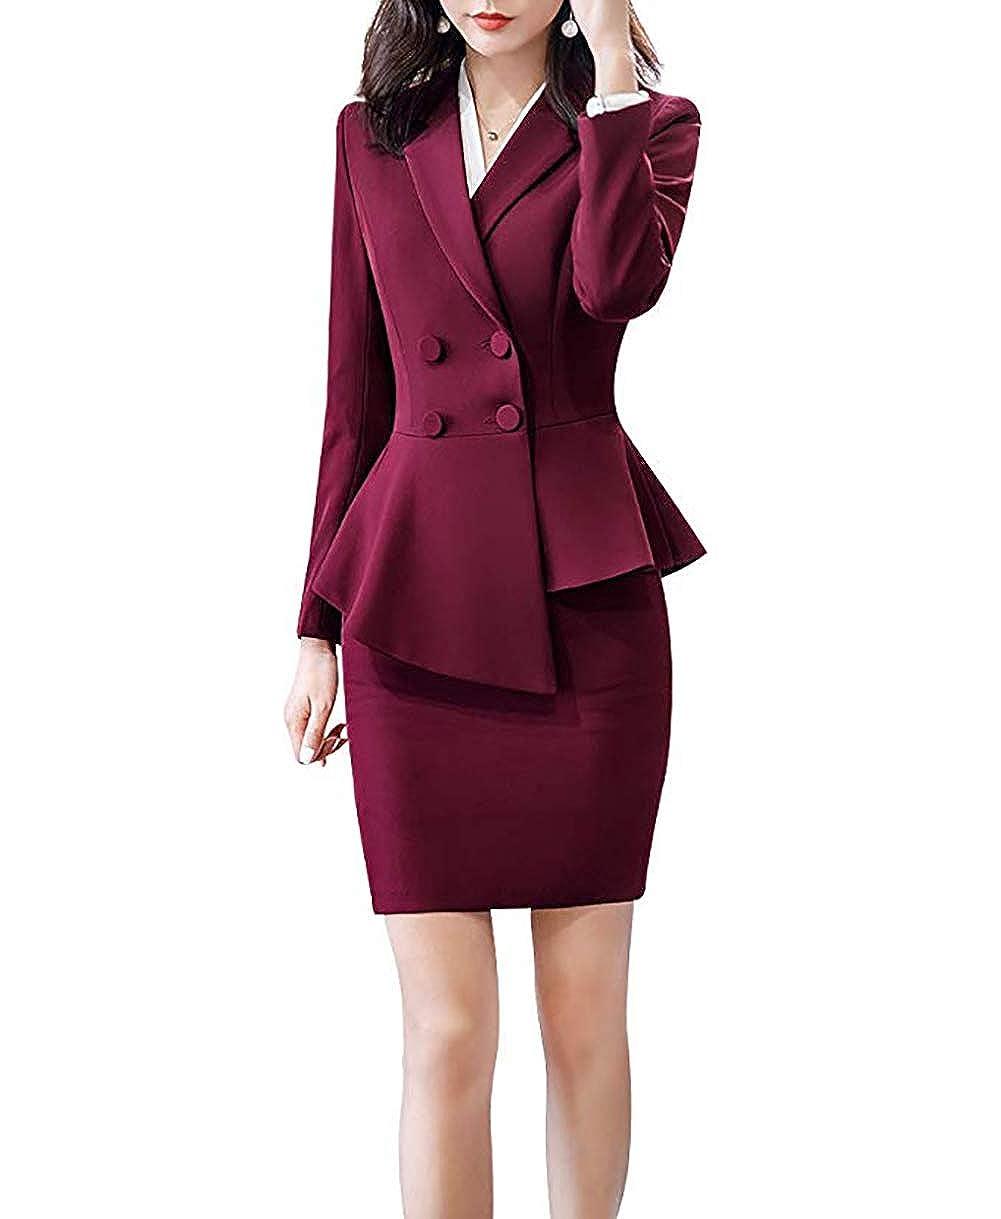 Dark Red LISUEYNE Women's 2 Pieces Office Blazer Suit Work Blazer Jacket,Pant Skirt